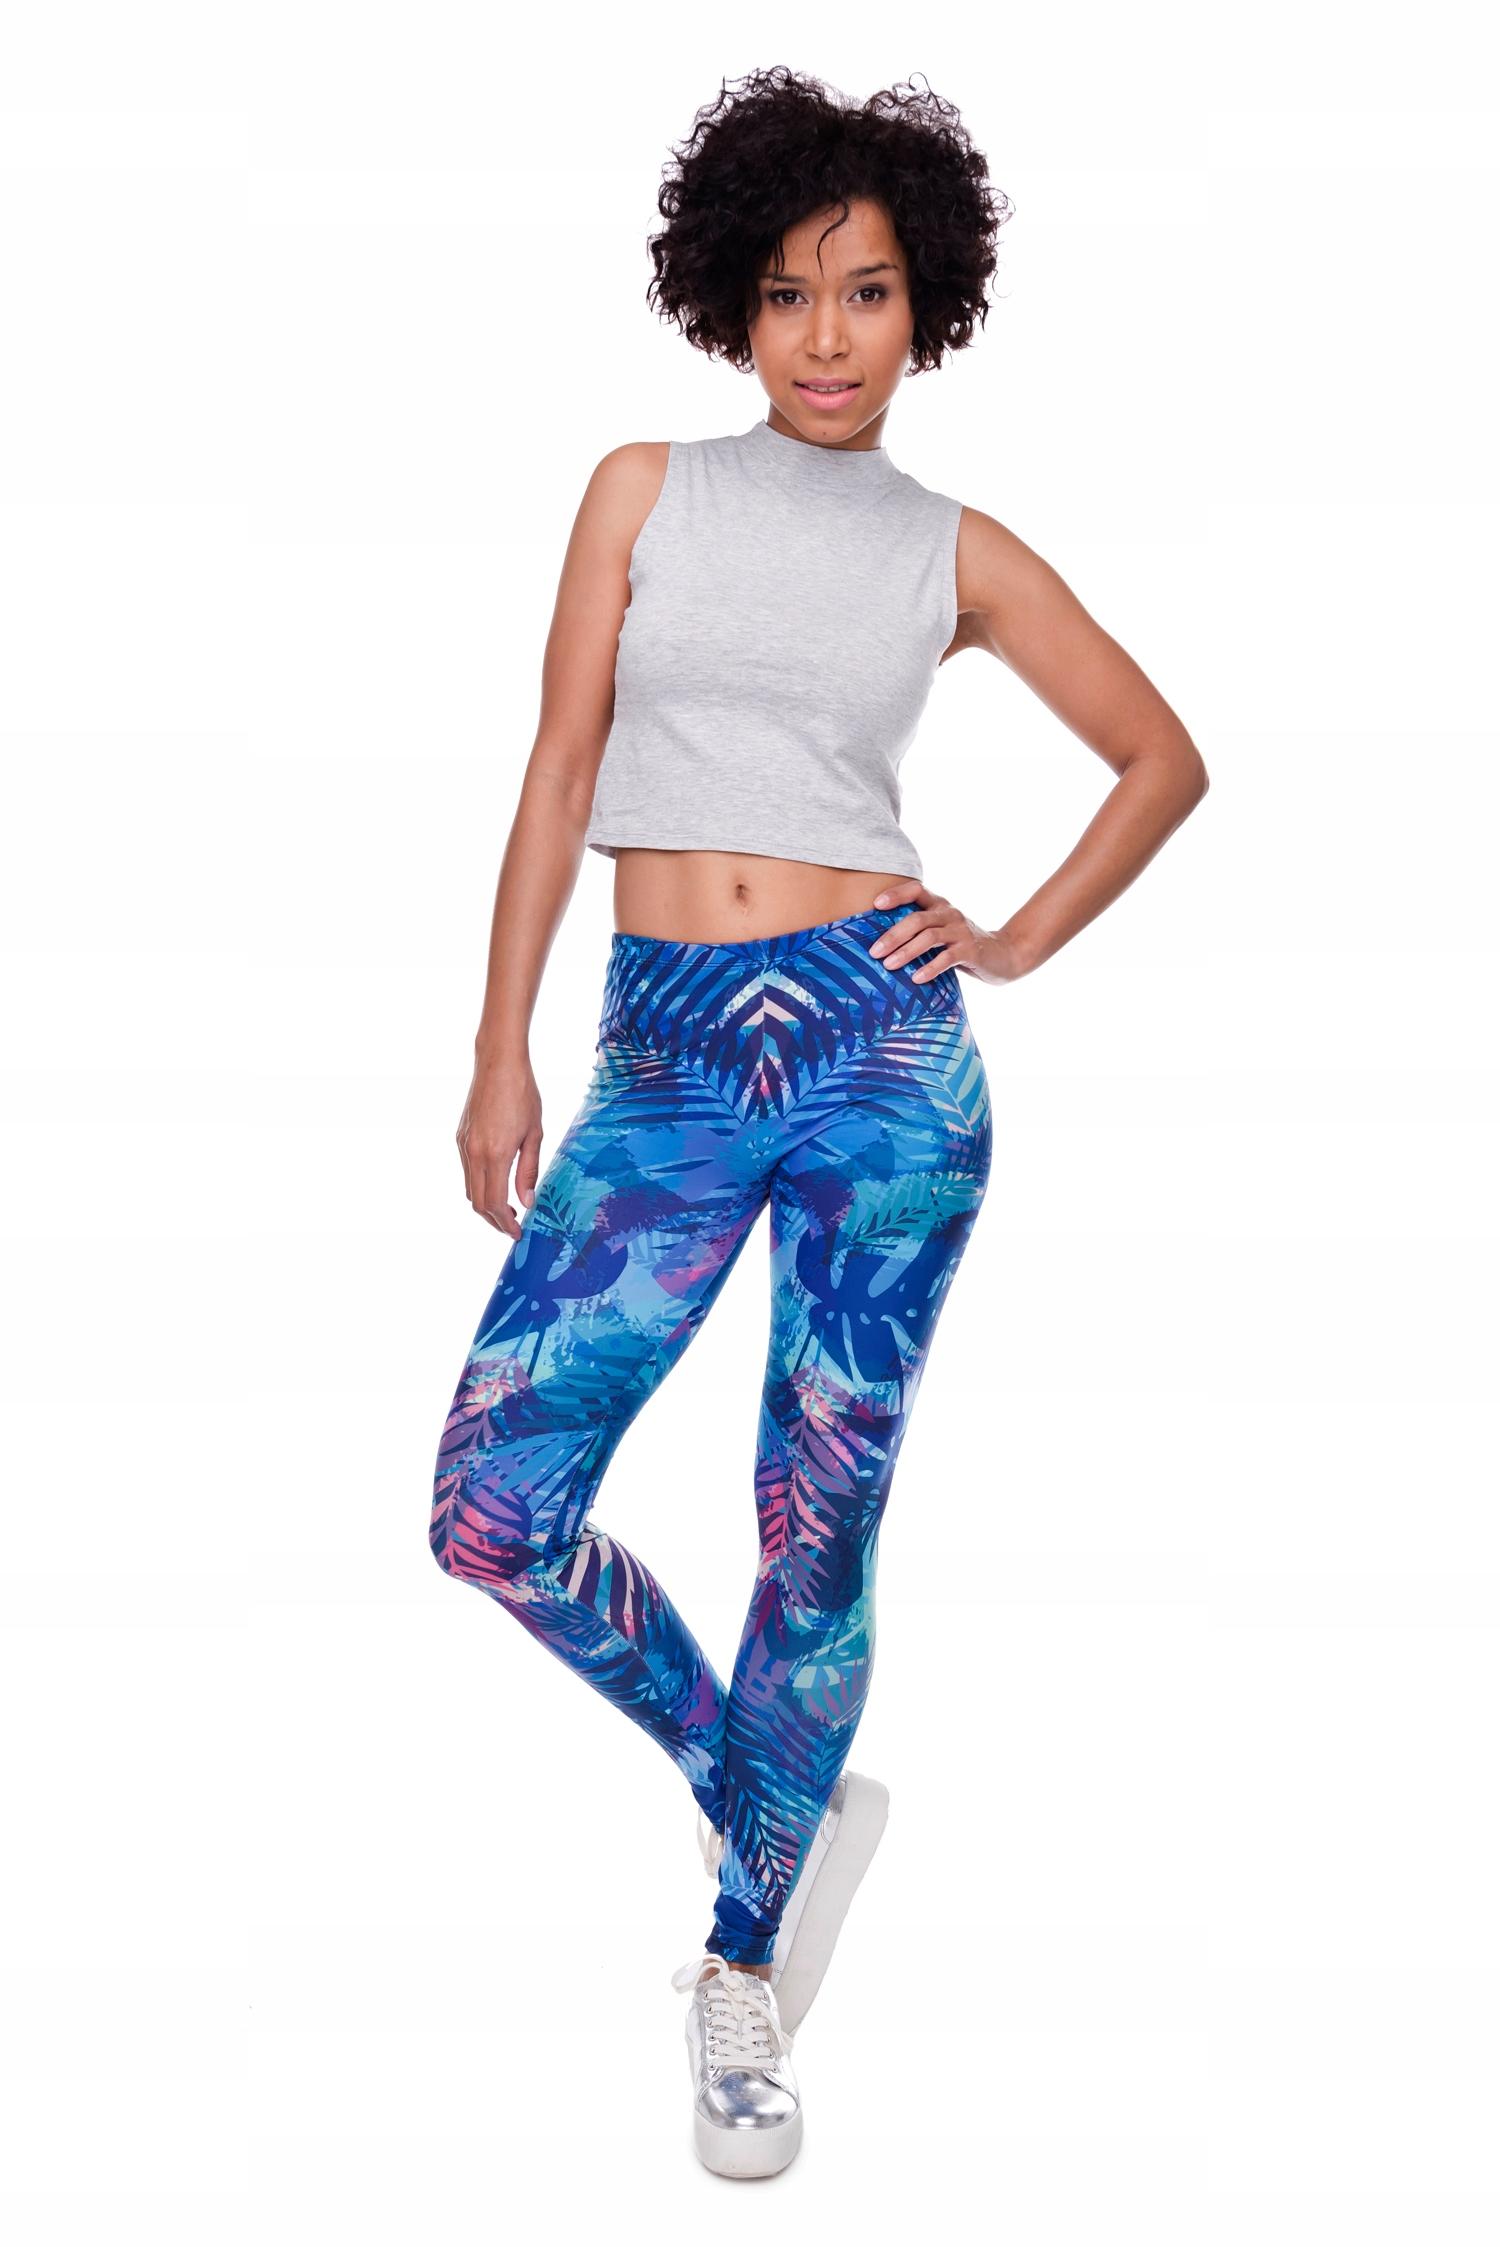 4d8f5c24bd1af ZOHRA Official kolorowe legginsy fitness siłownia - 7685661515 ...